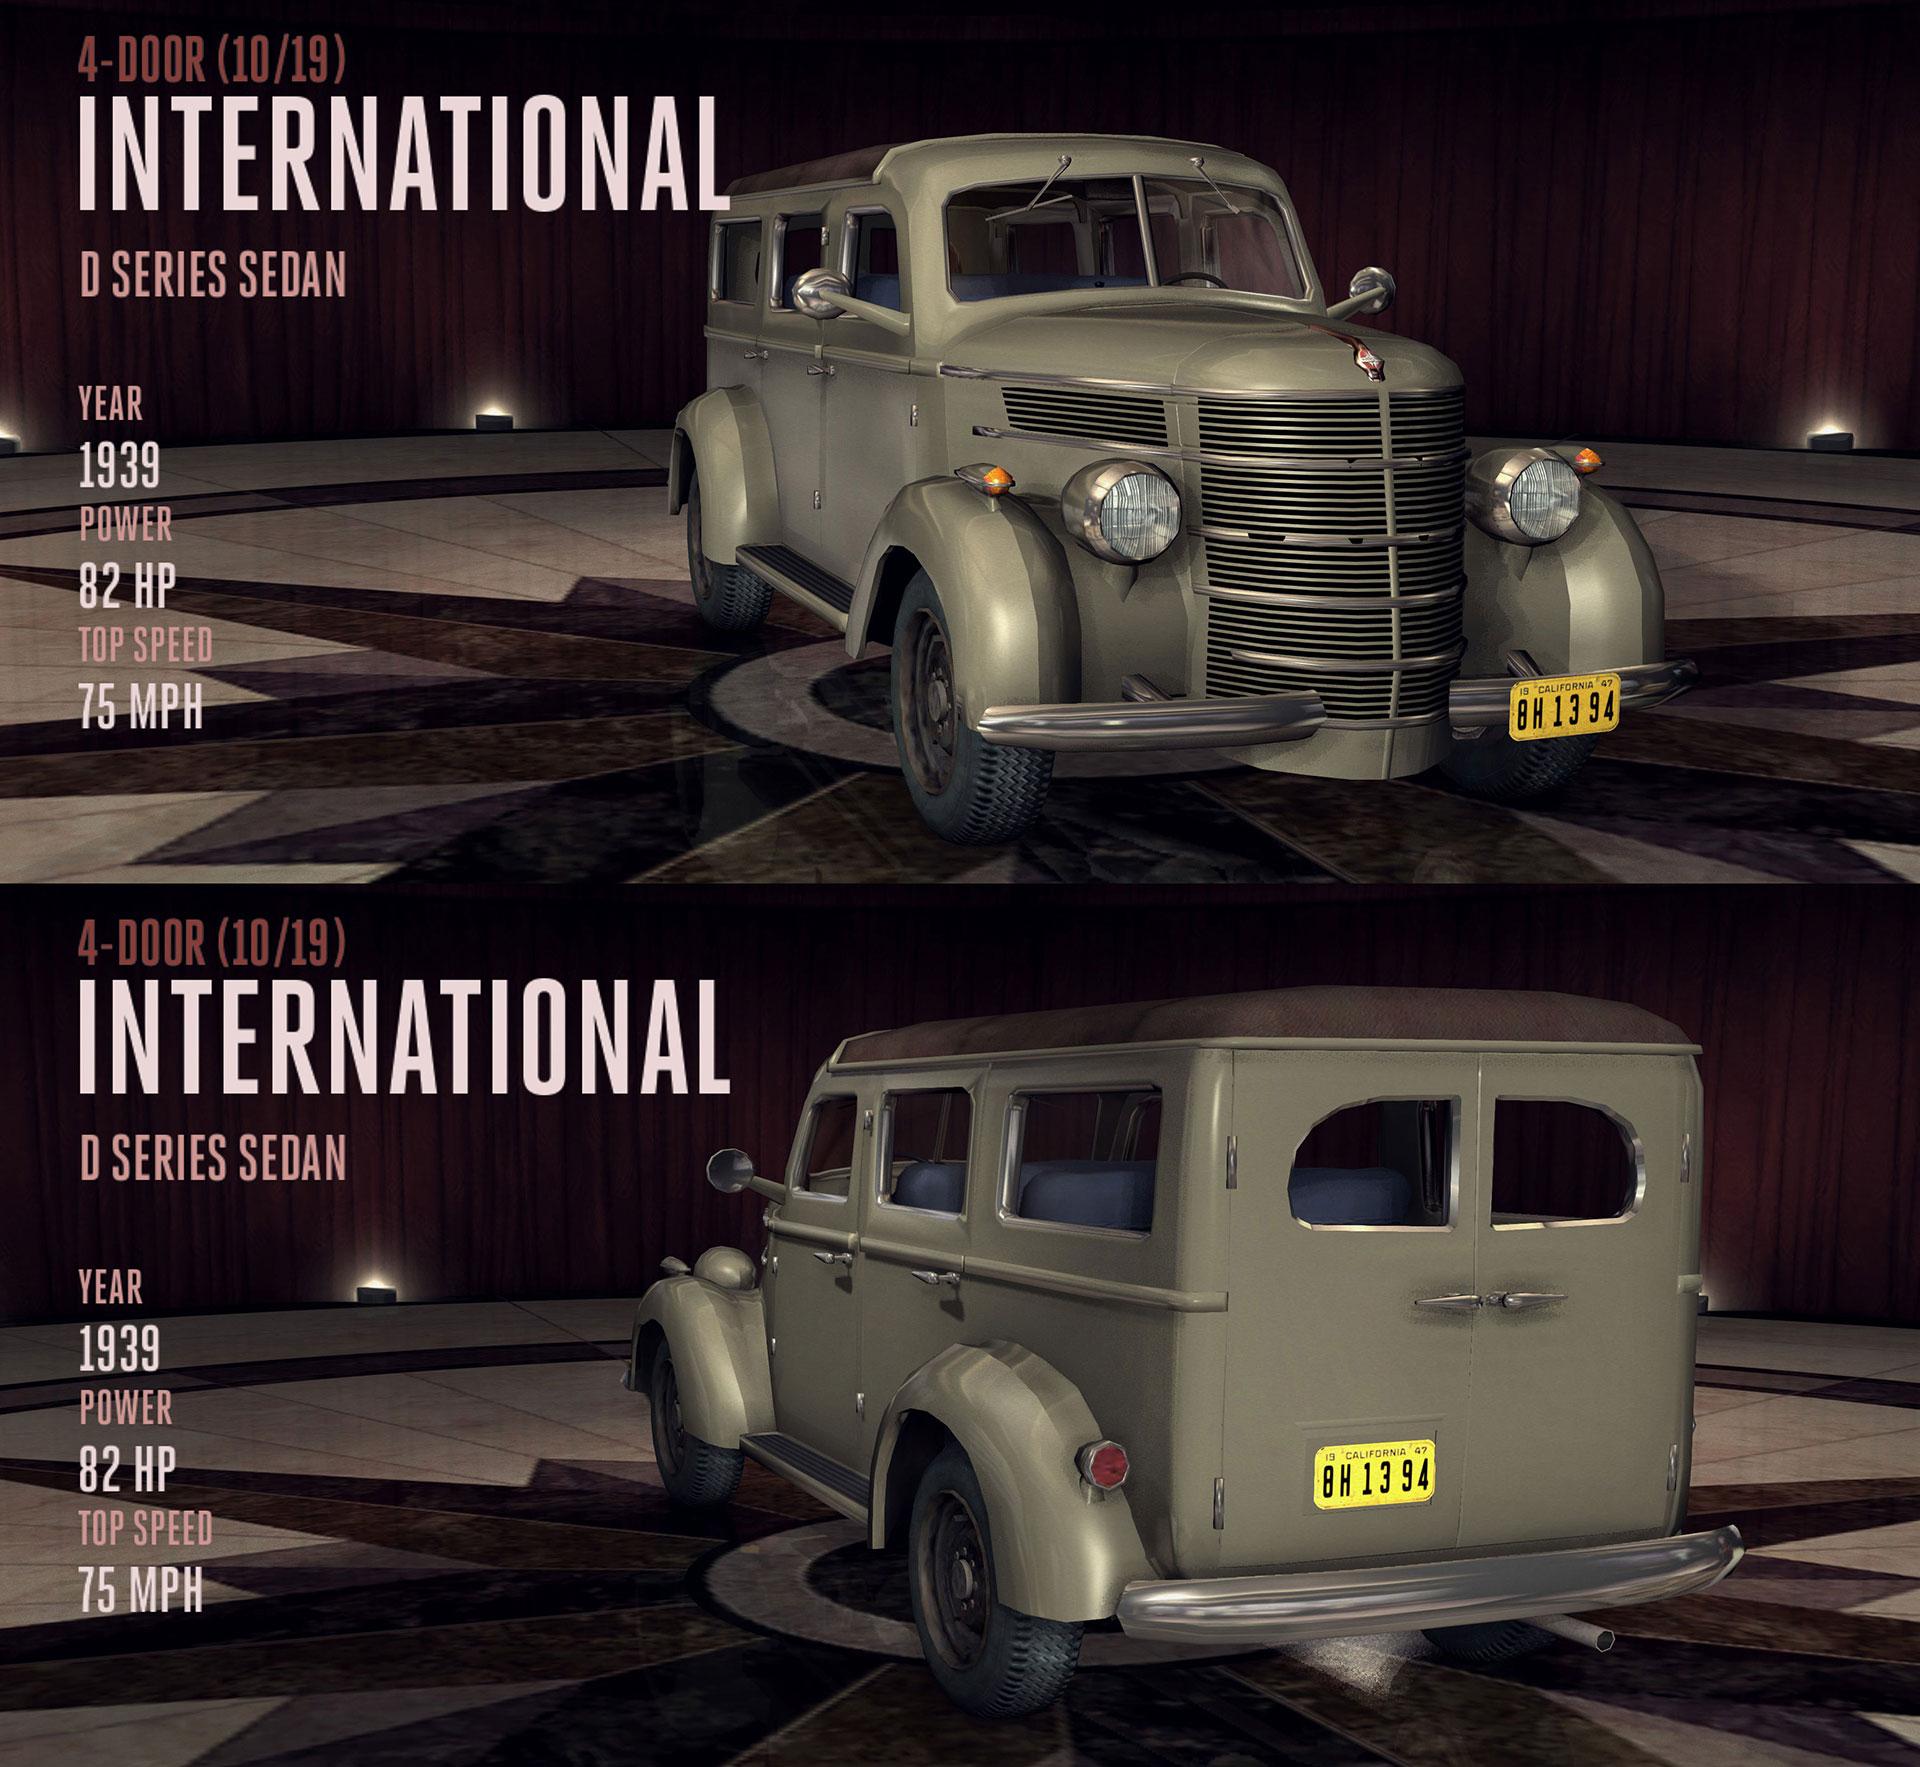 File:1939-international-d-series-sedan.jpg